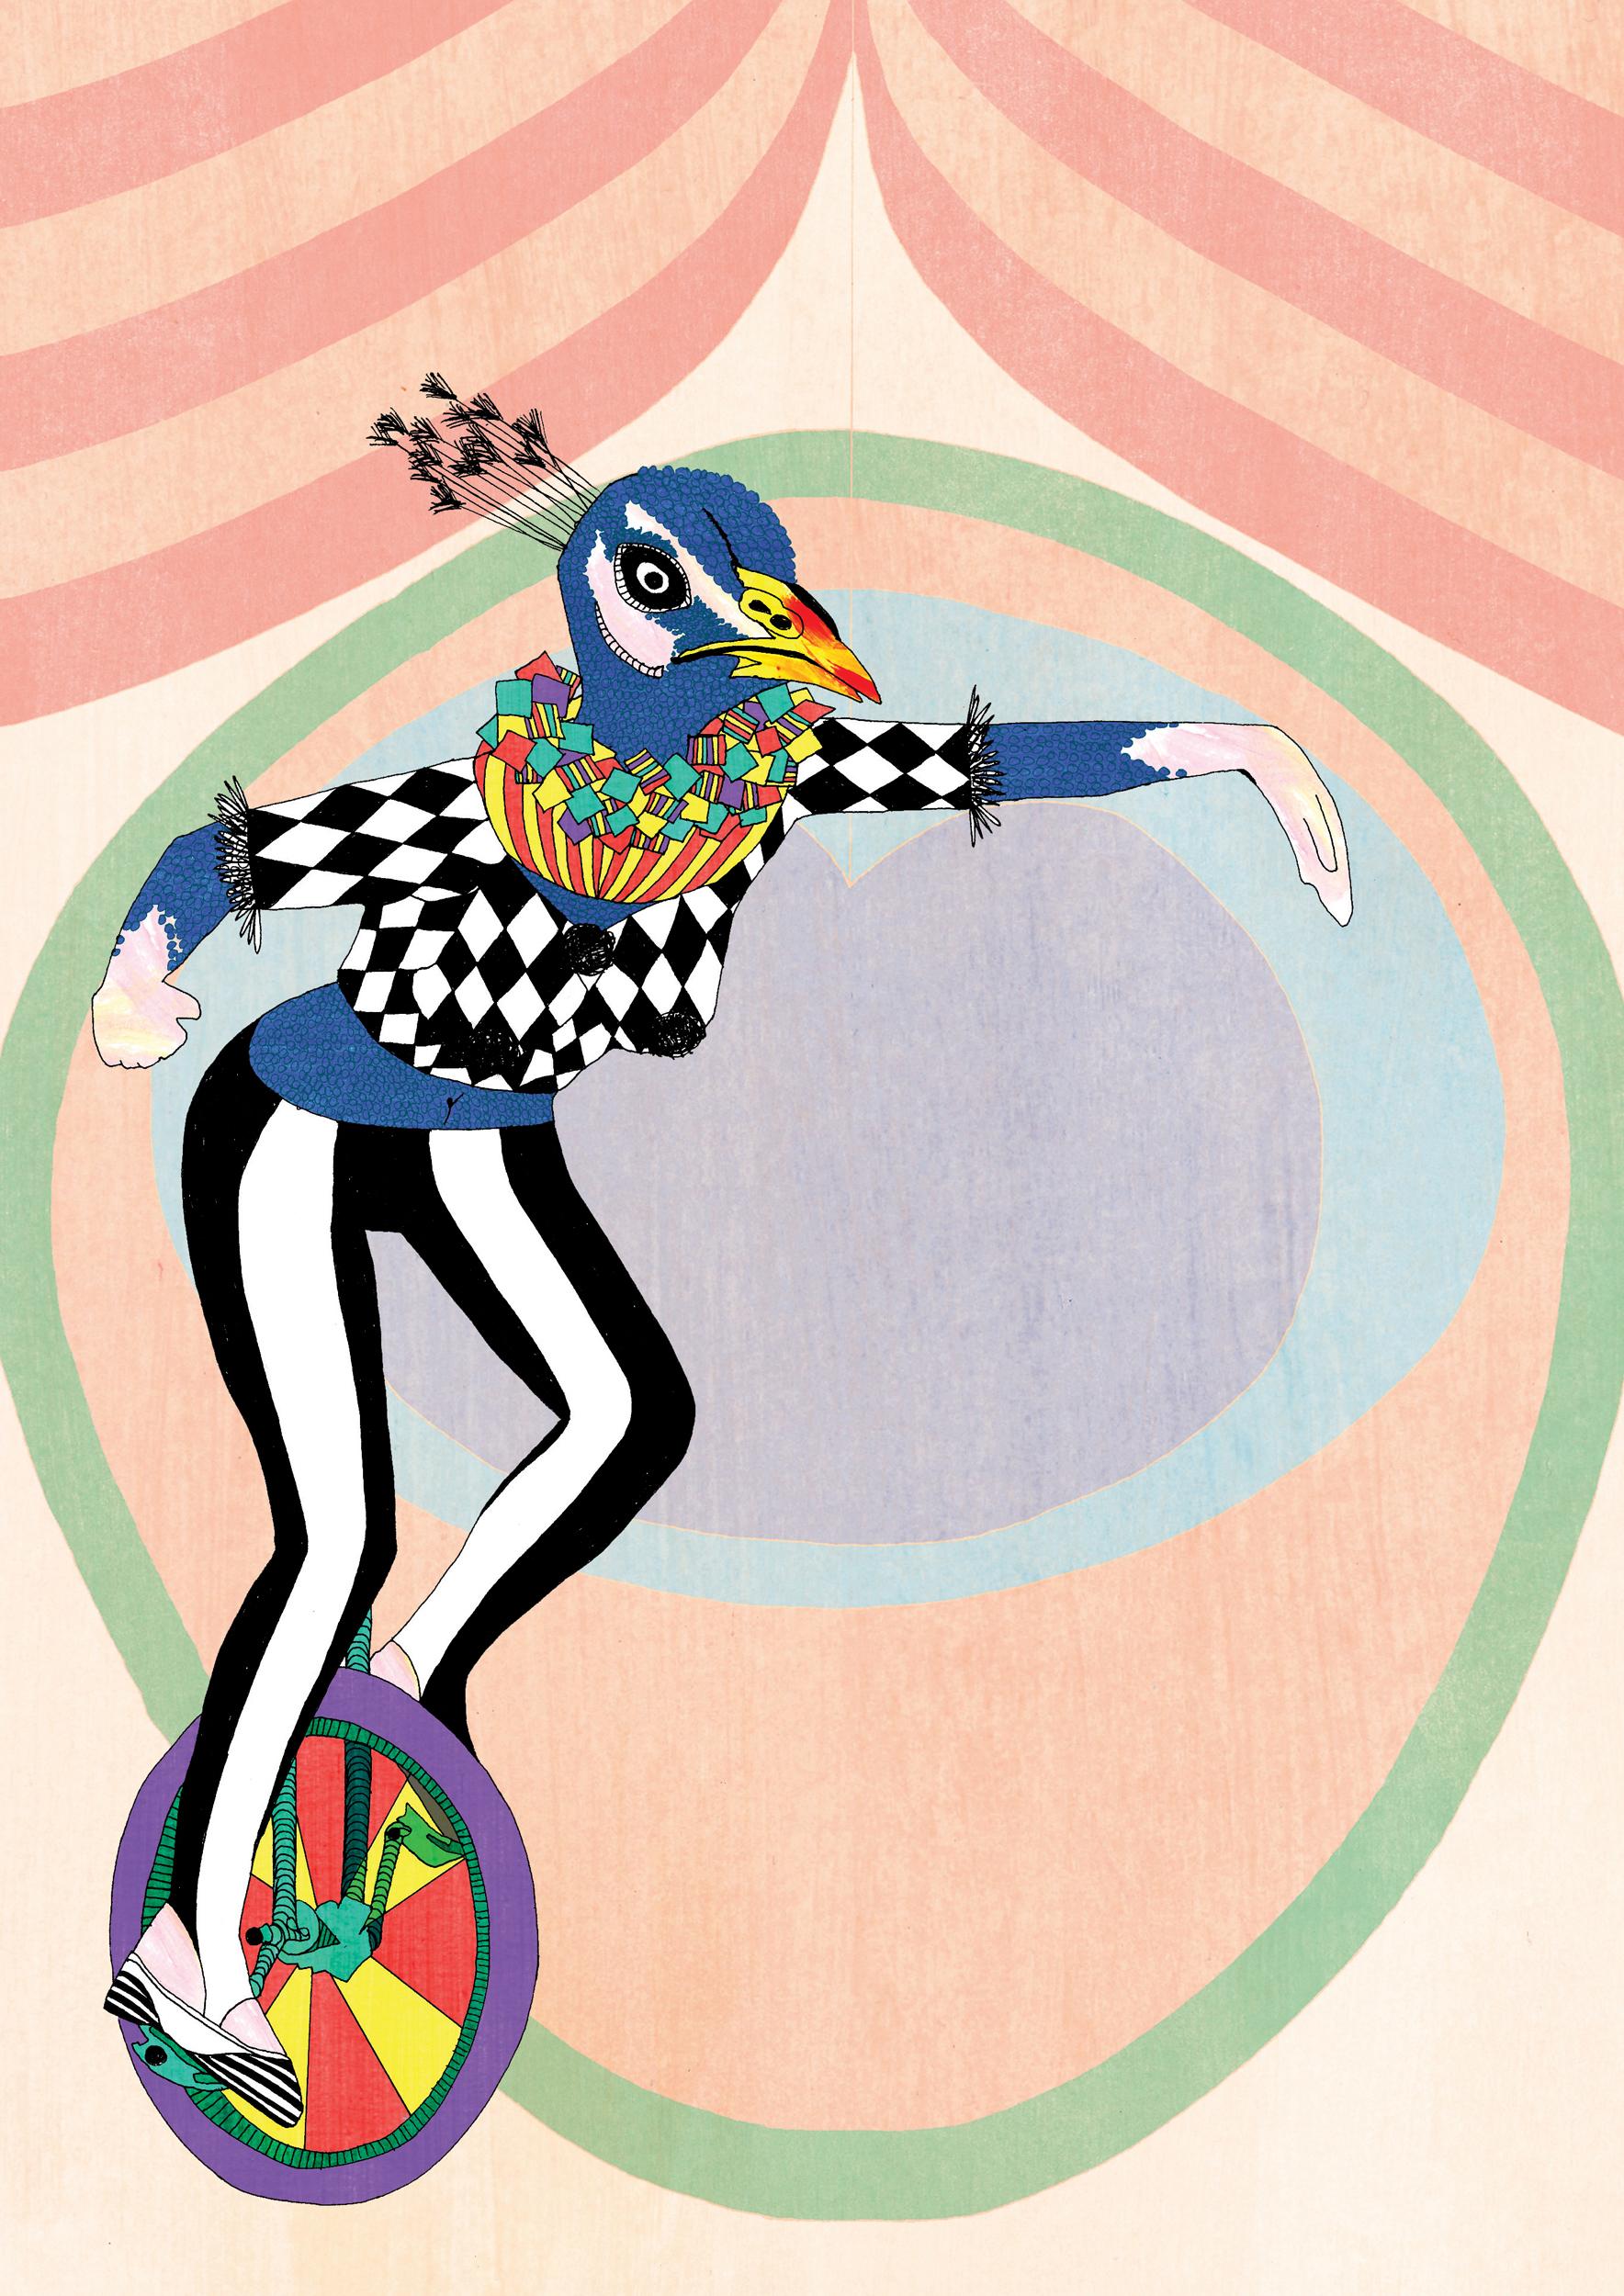 Blind Pig presents: The Vintage Circus